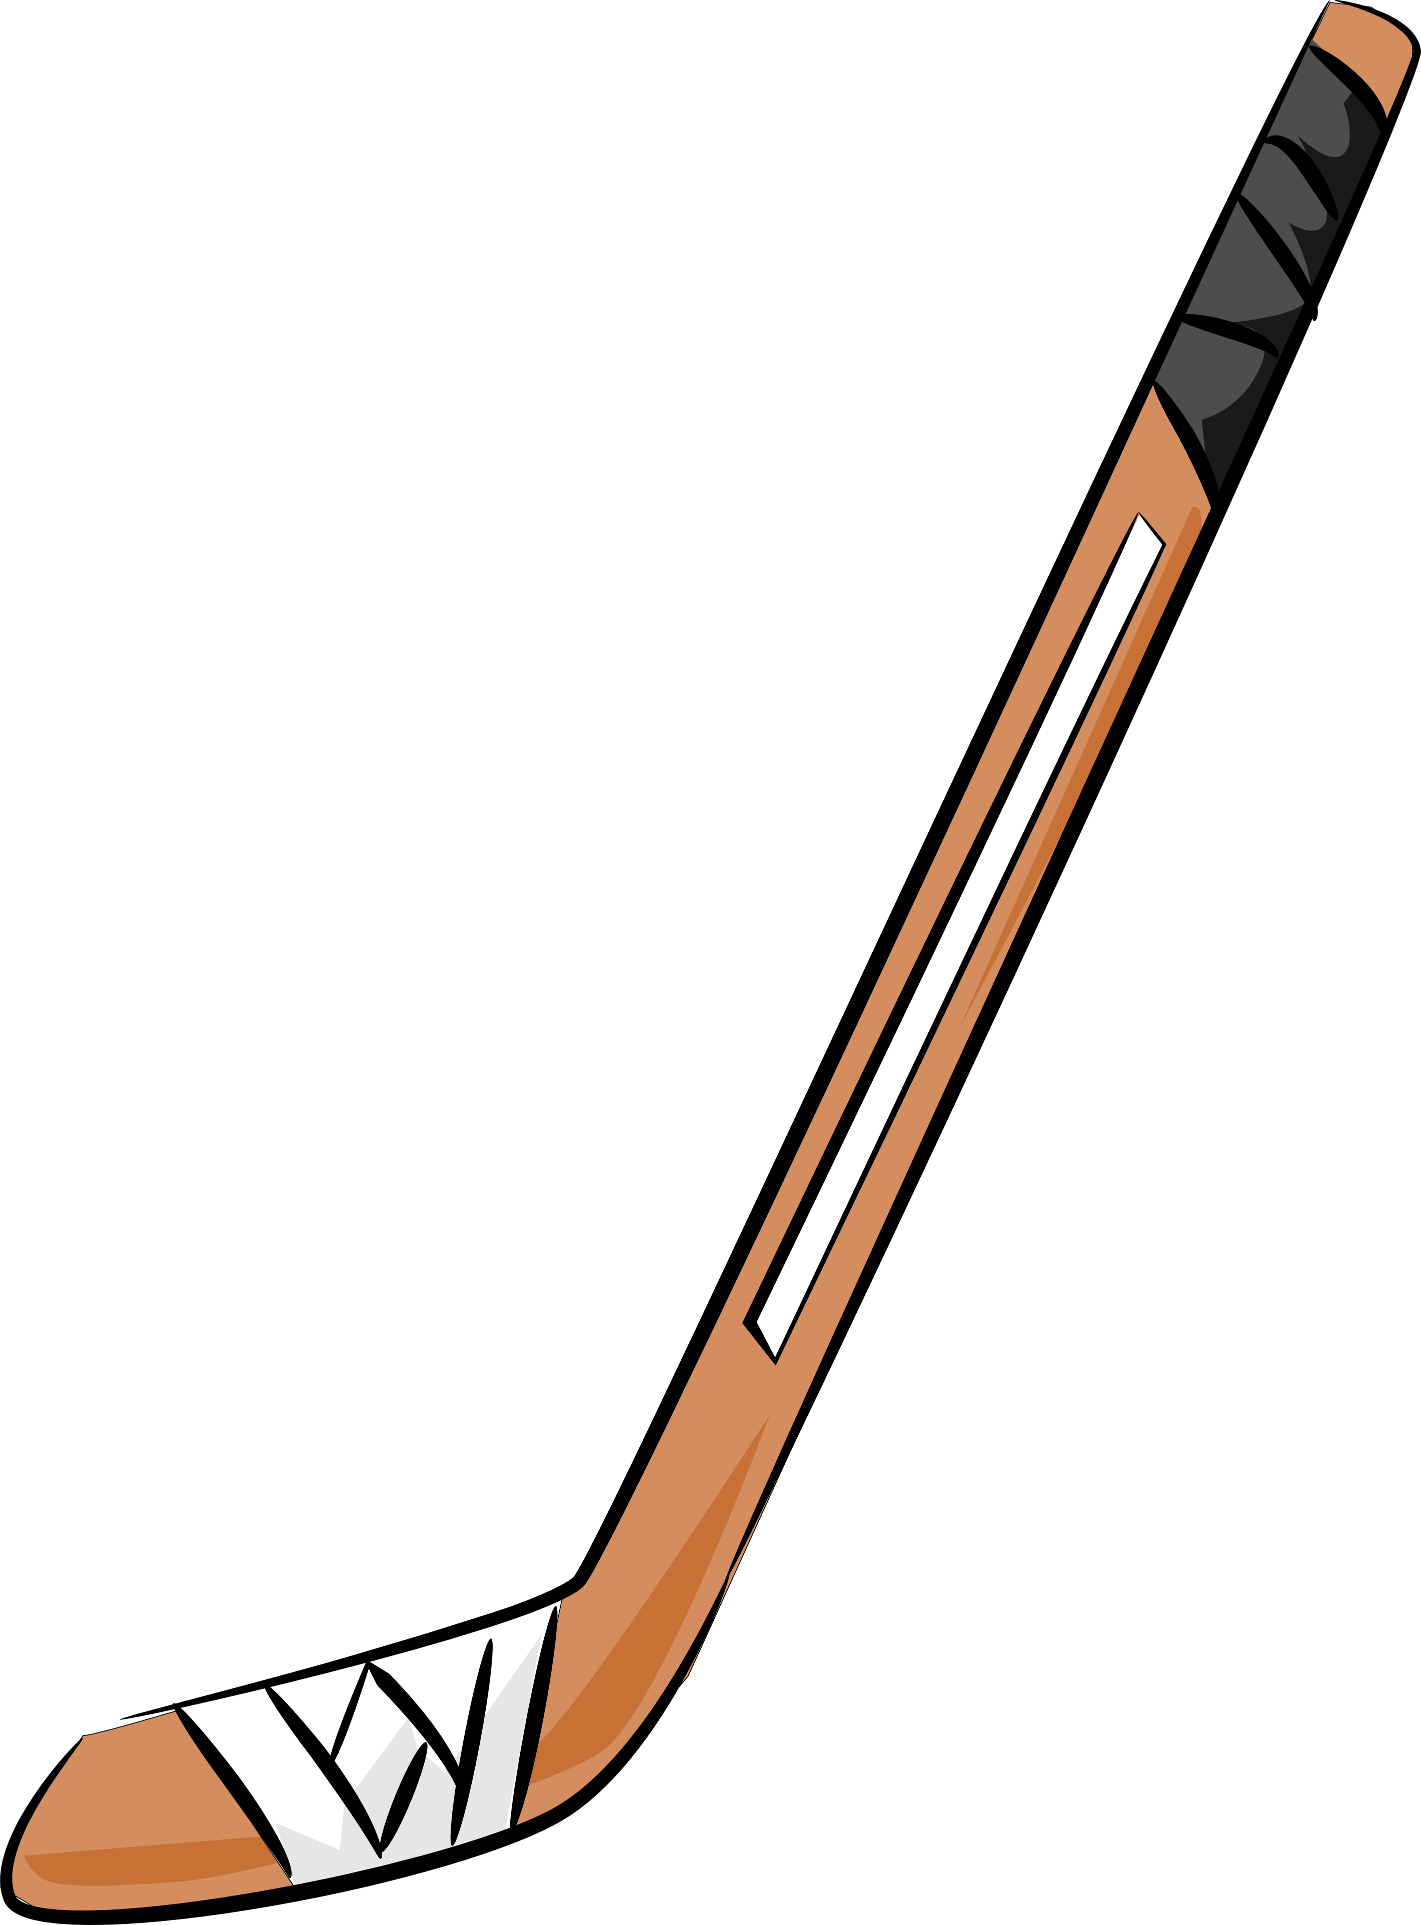 Hockey Stick Clipart Best